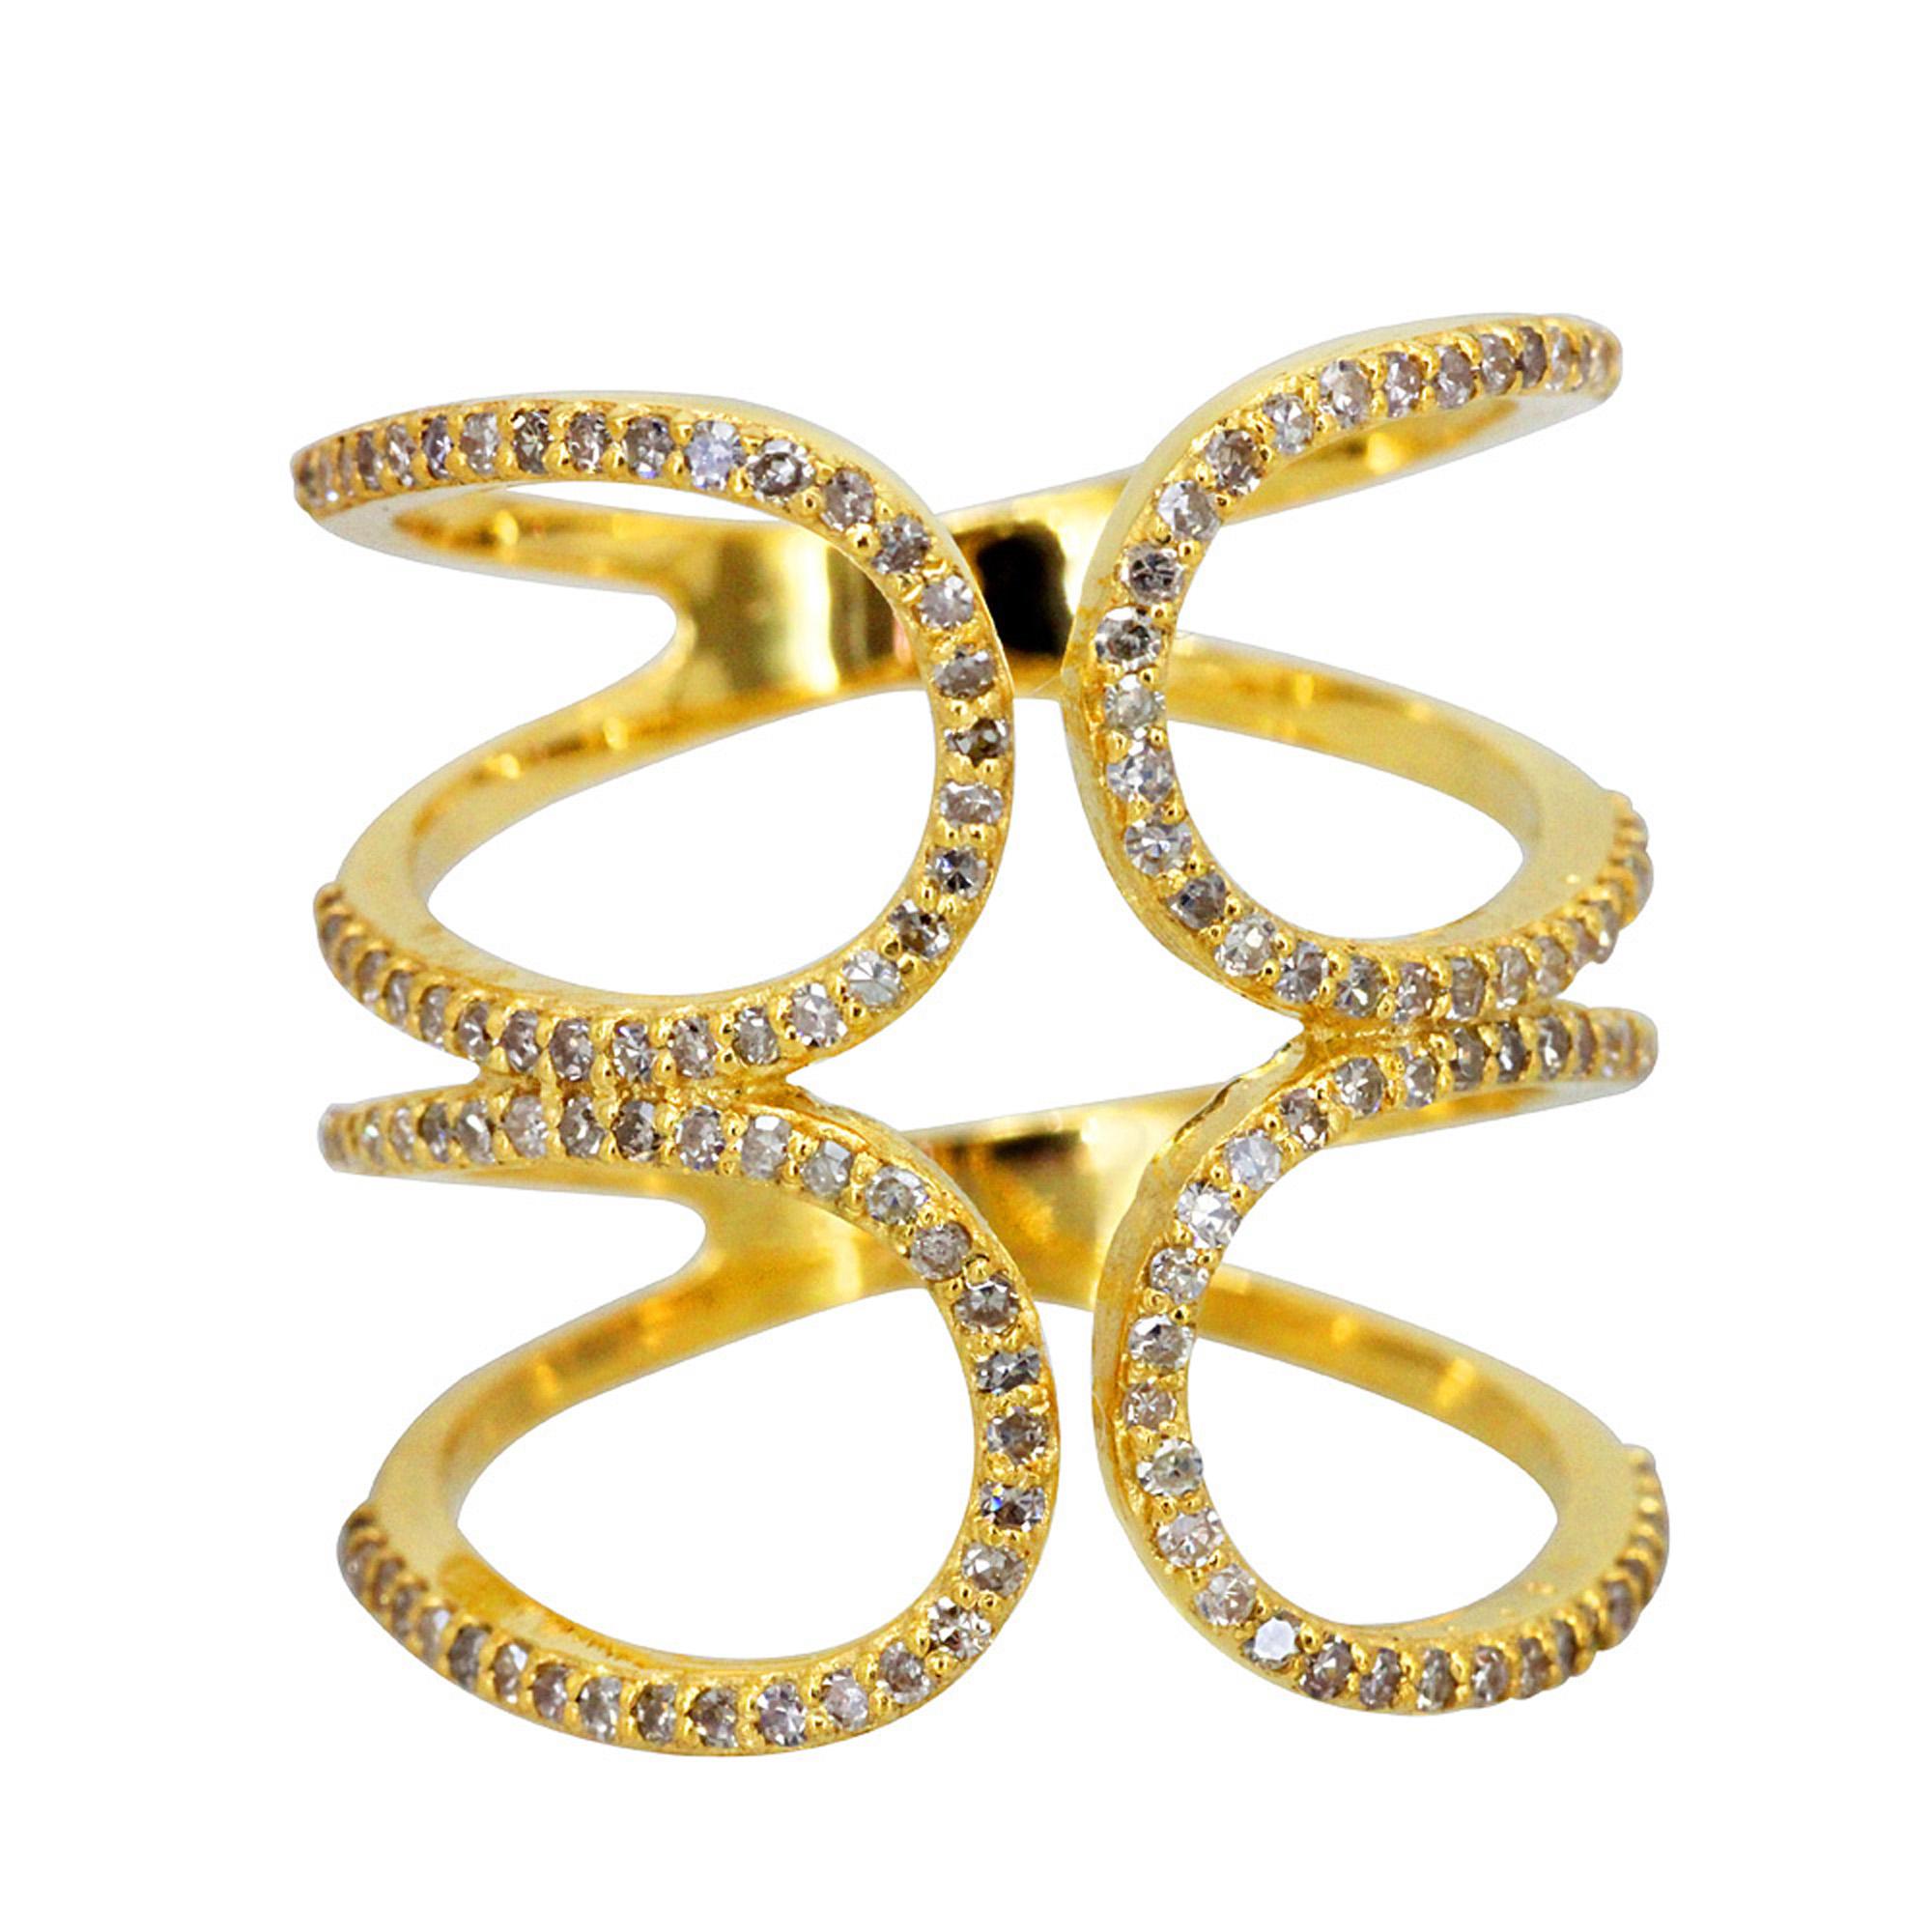 Natural diamond designer ring, 18k solid gold fine jewelry